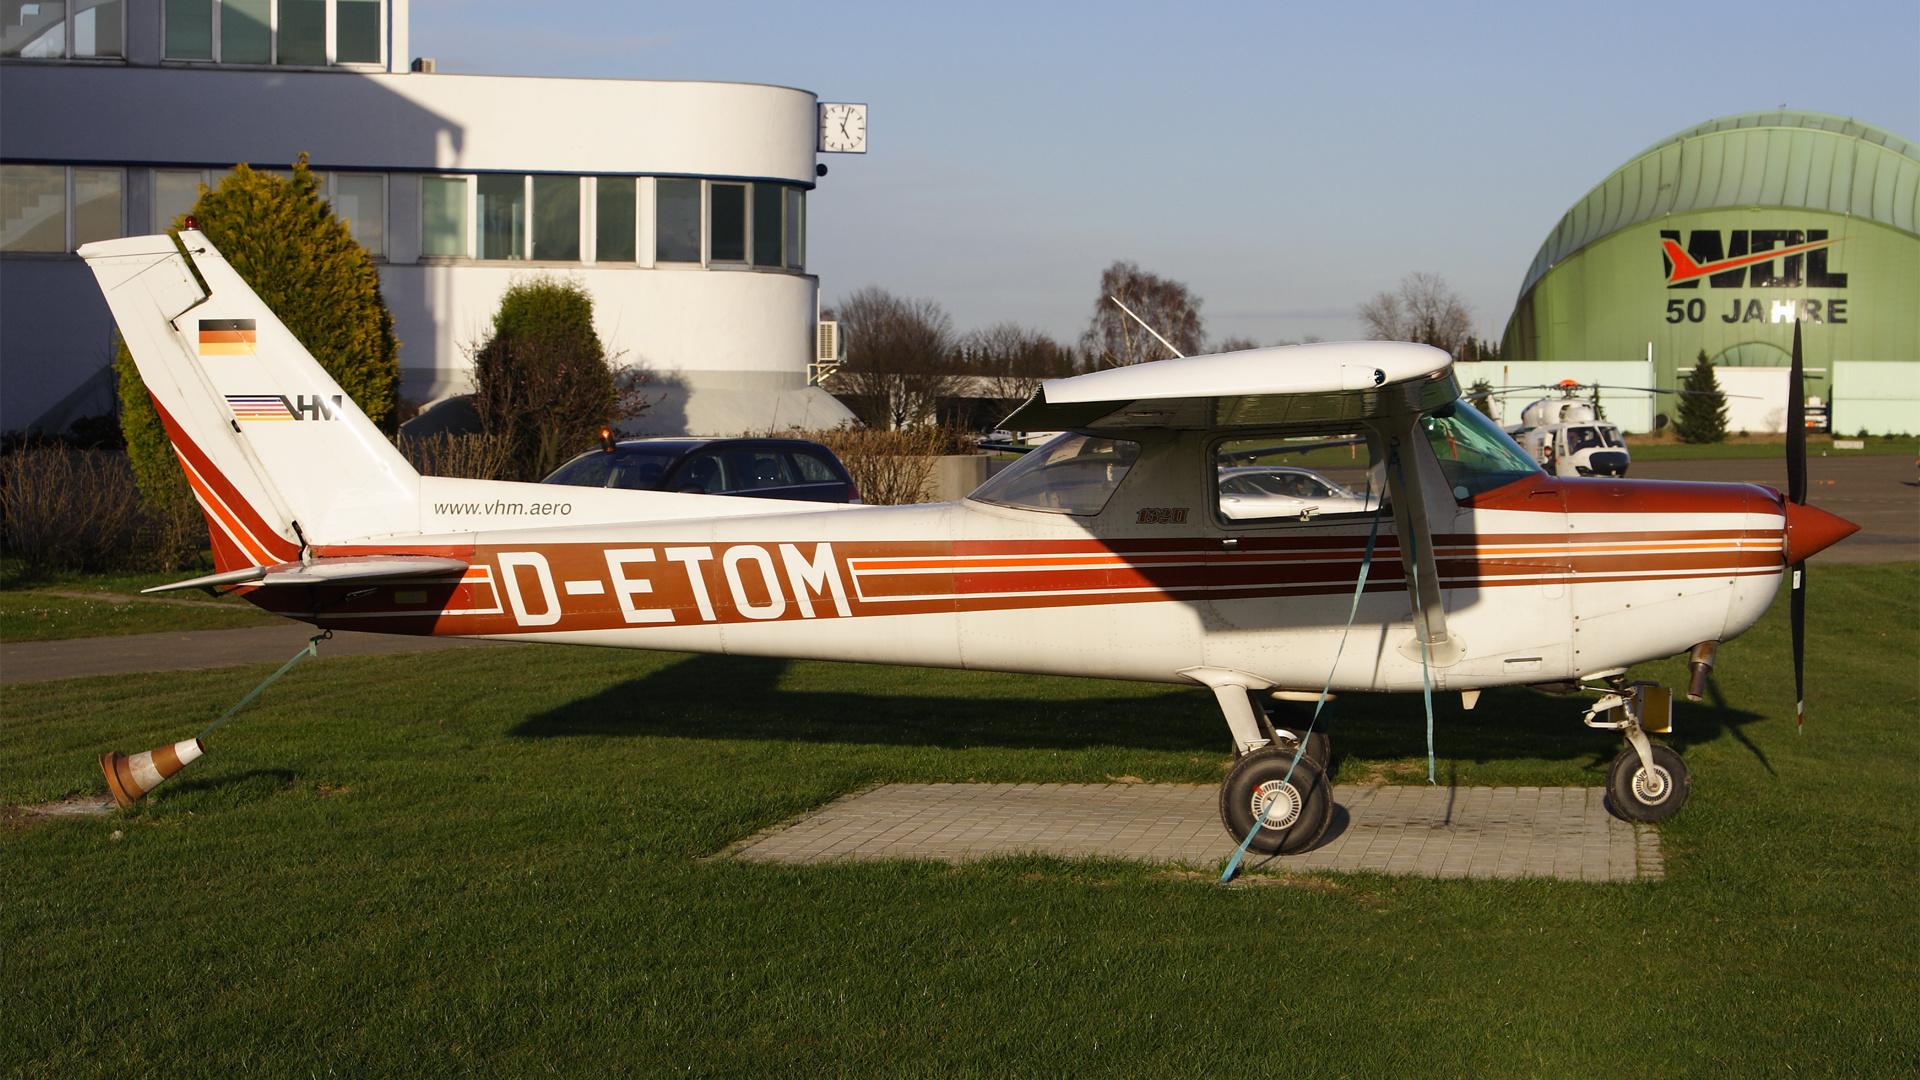 D-ETOM-1 C152 ESS 200803